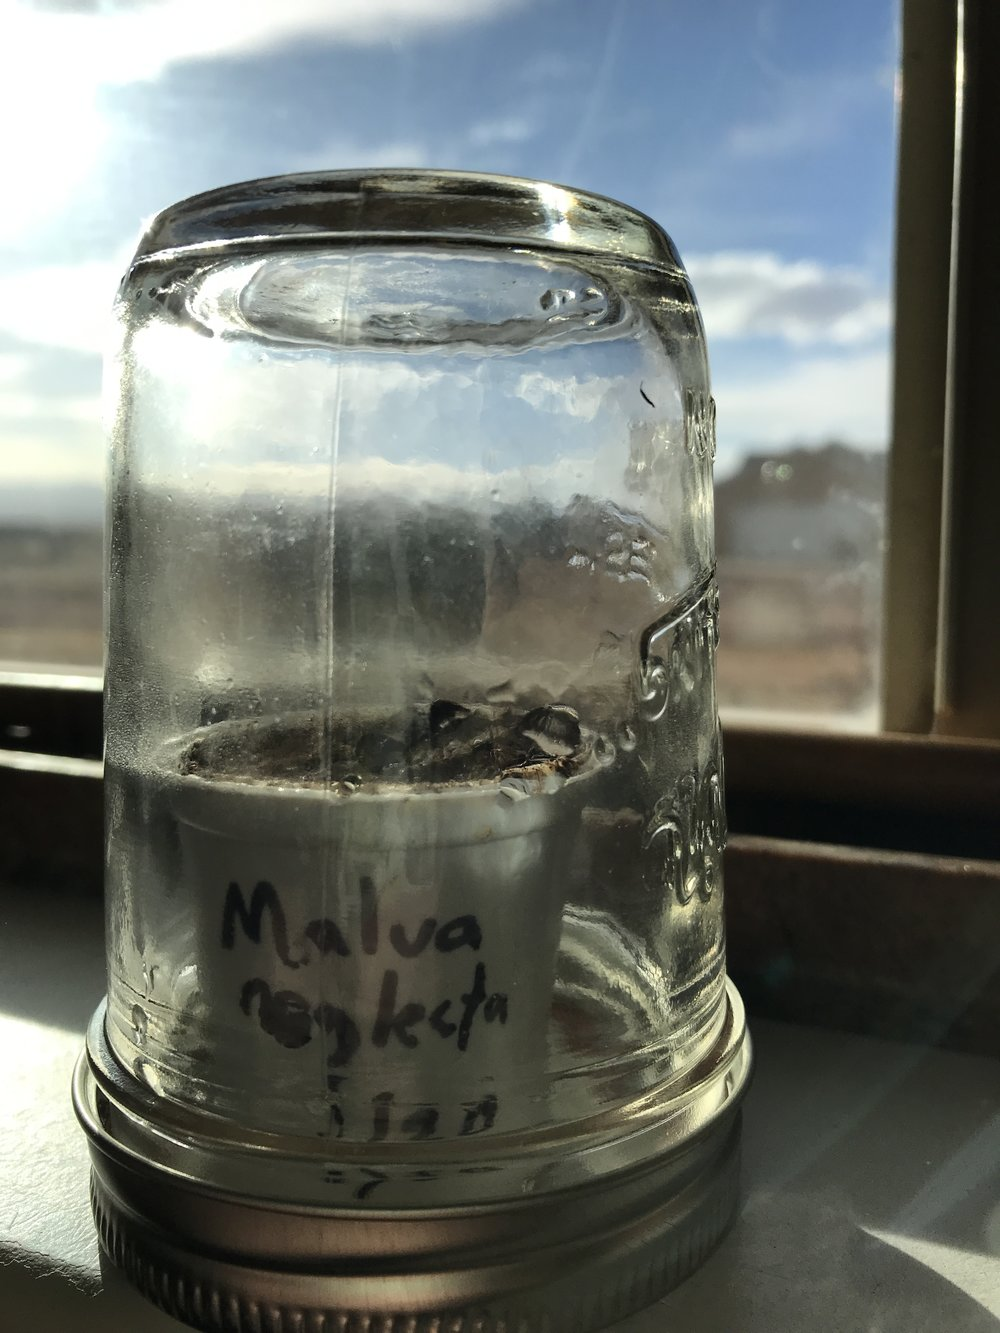 1/20:  Malva neglecta  seeds in a K-Cup Terrarium on a sunny windowsill.